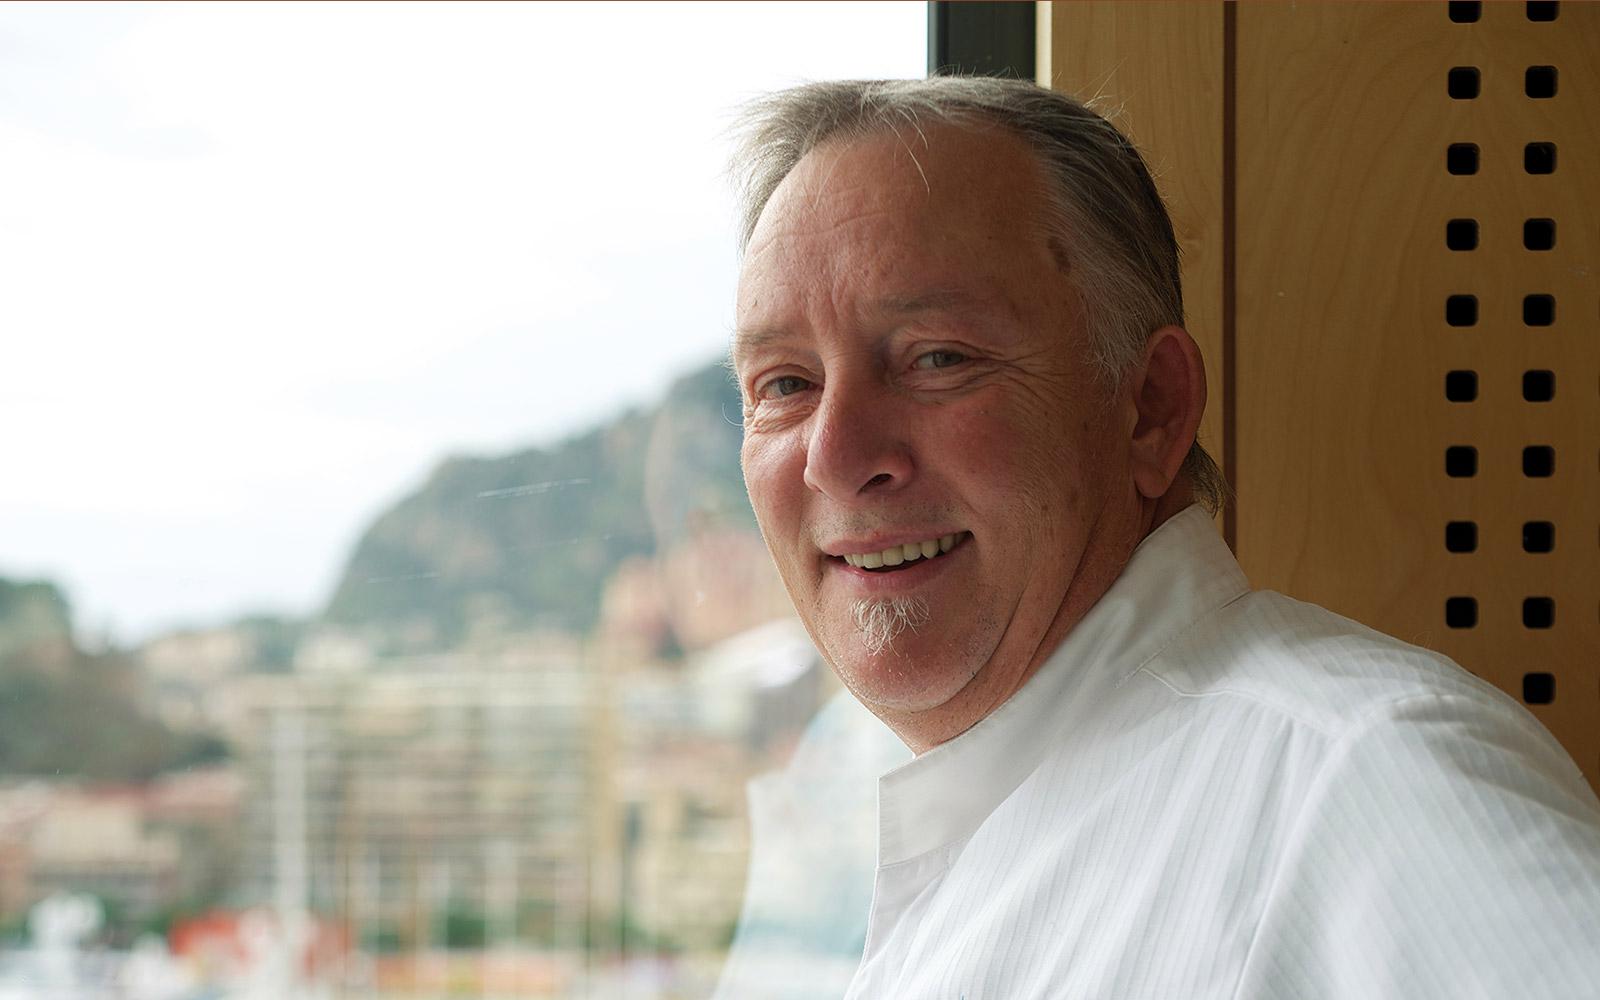 Thermes-Marins-Jacky-Oberti-@-Monte-Carlo-SBM-Jean-Jacques-lHeritier